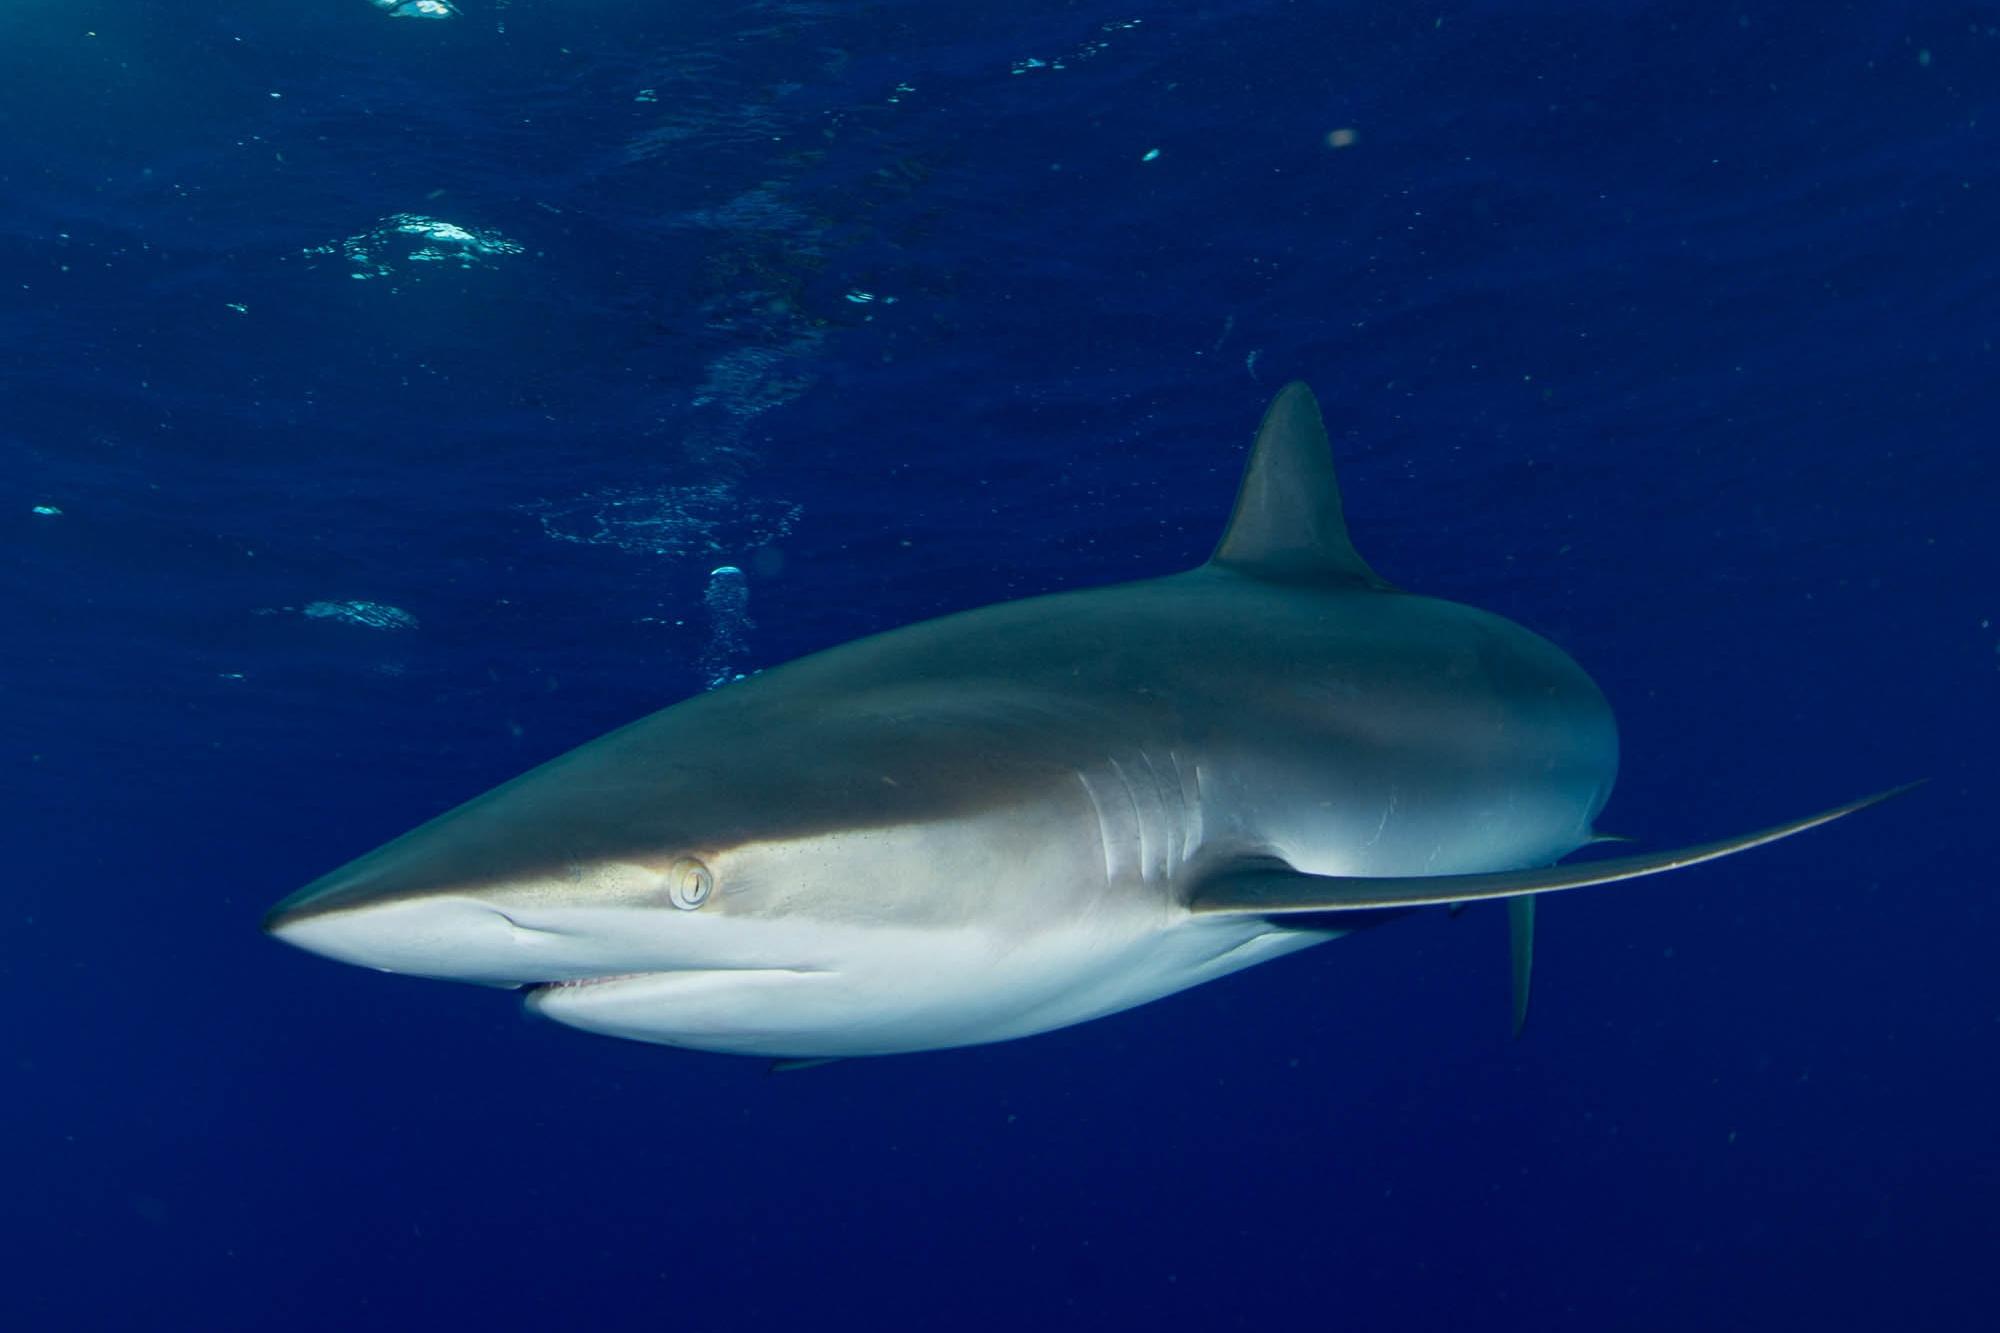 shark in cuba credit: david gross / coral reef image bank